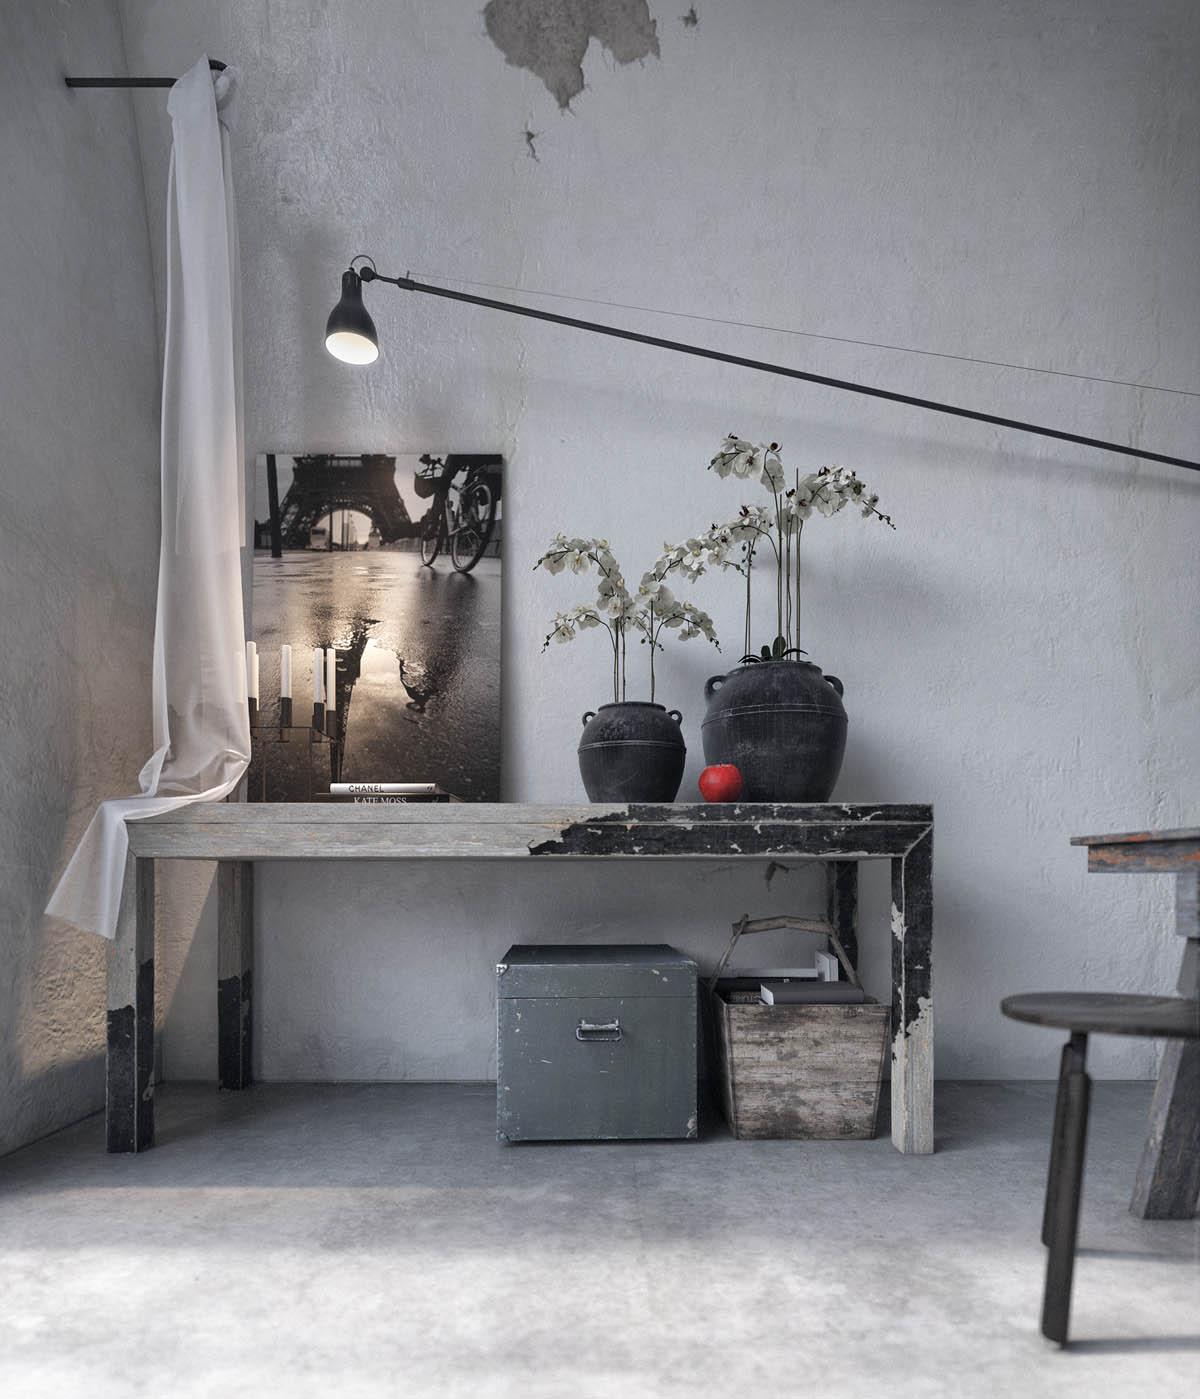 Interior Design Rustic Furniture: Two Examples Of Industrial Modern Rustic Interior Design